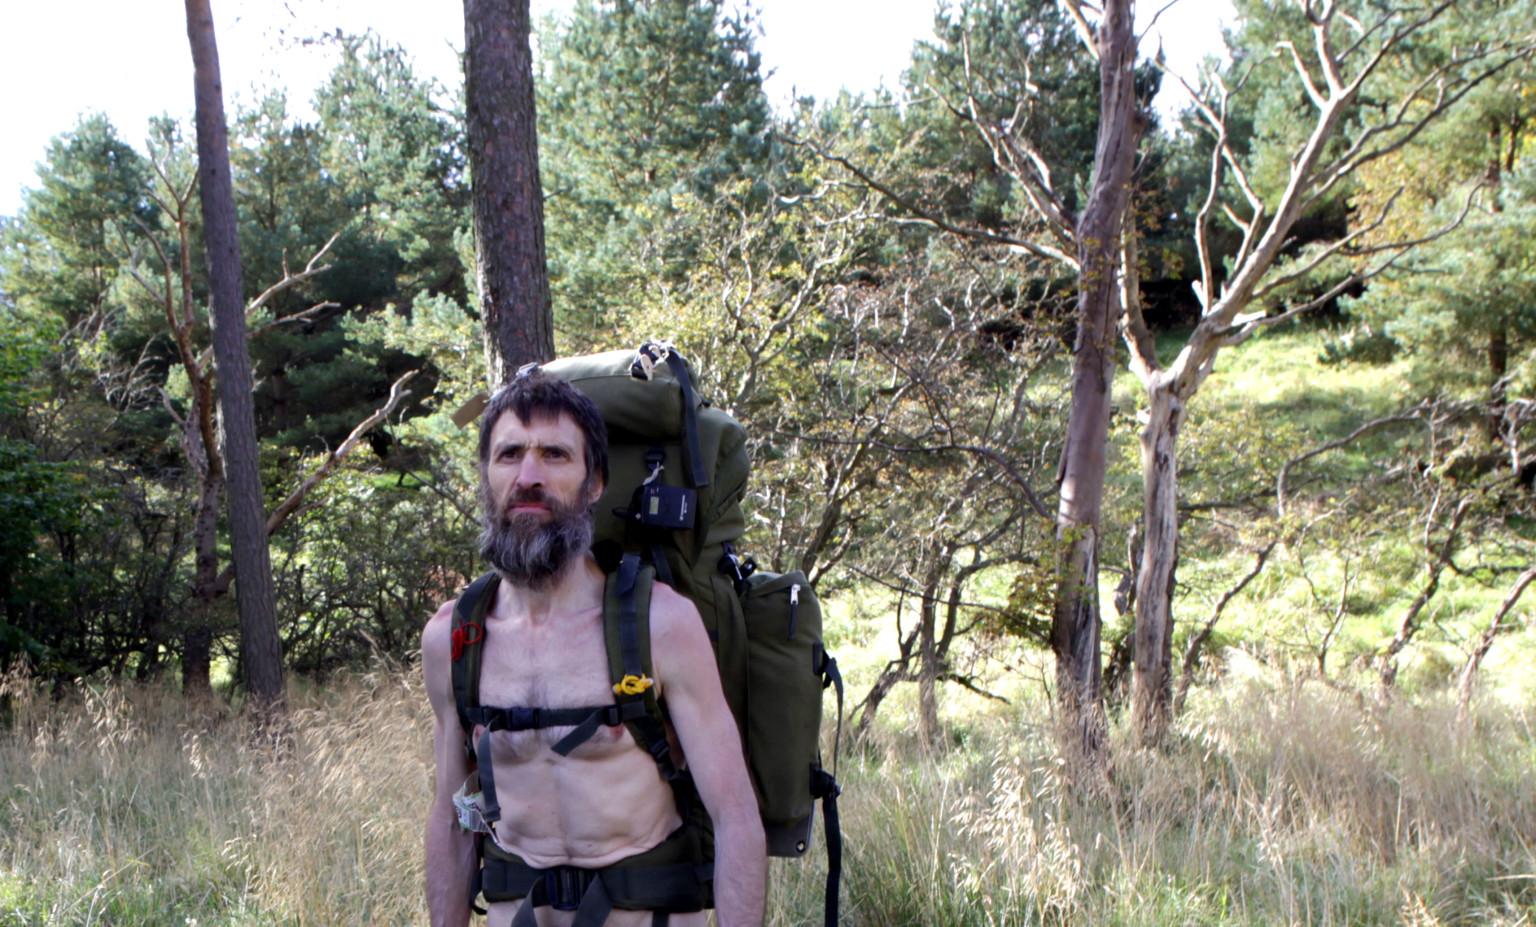 videos of girls hiking naked